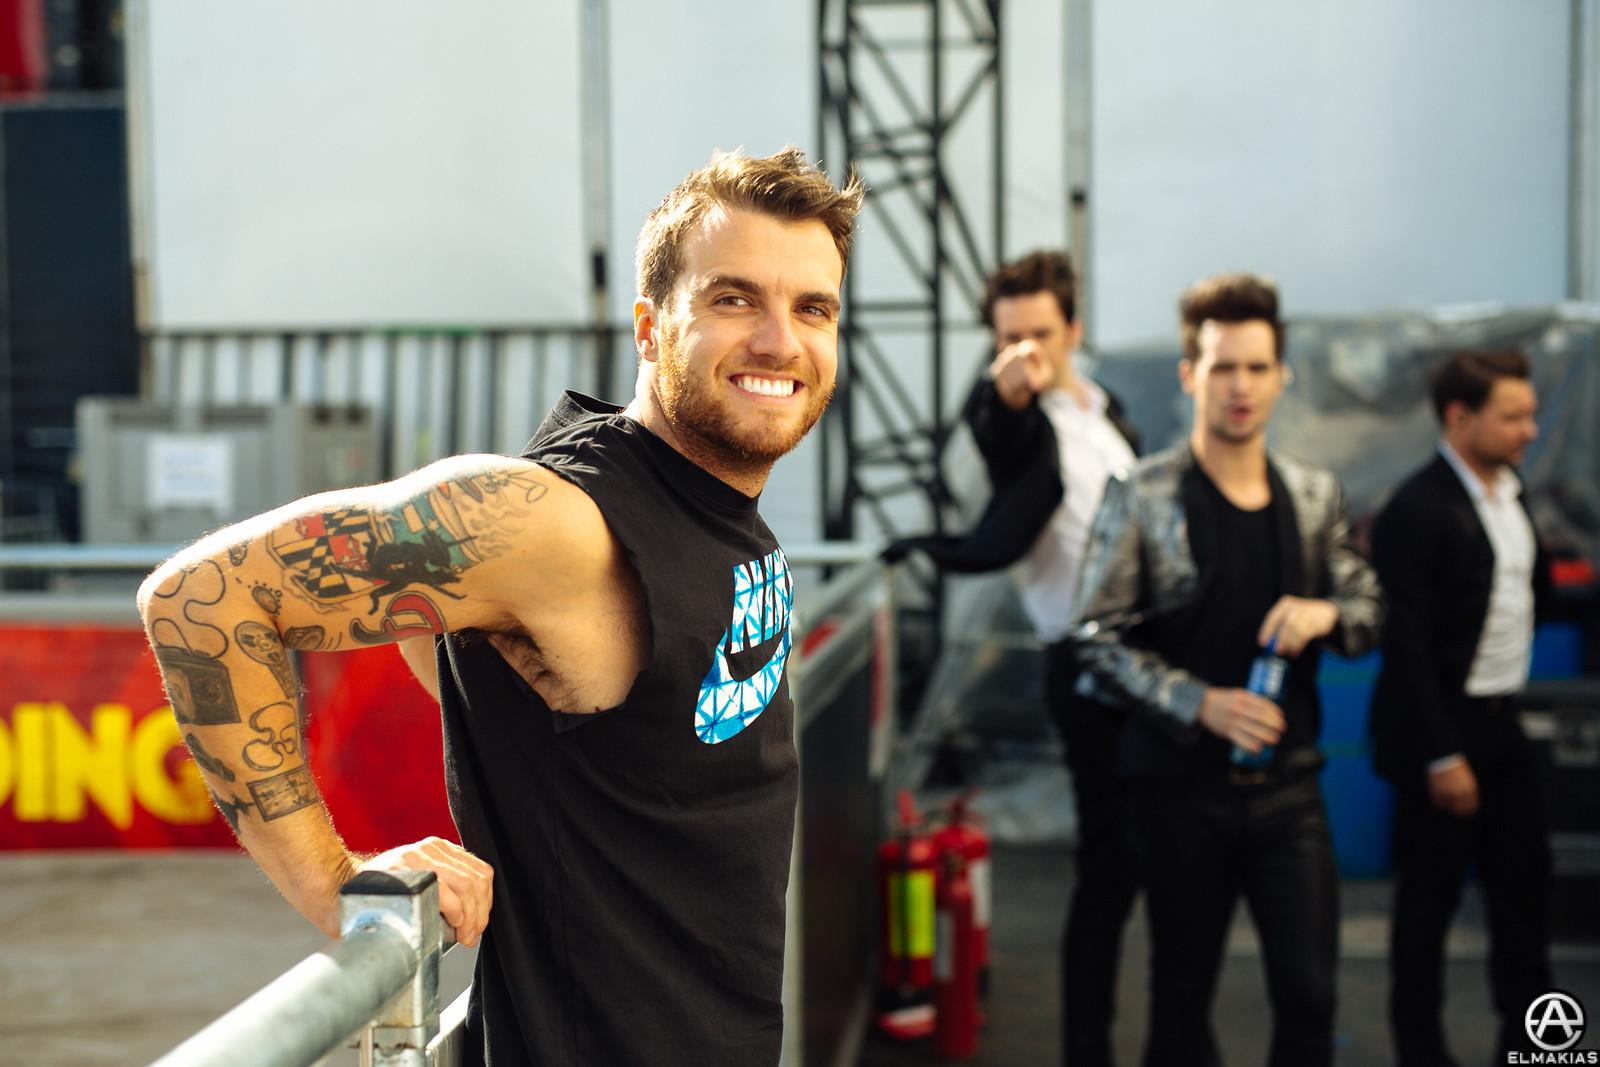 Rian Dawson of All Time Low at Reading Festival 2015 by Adam Elmakias